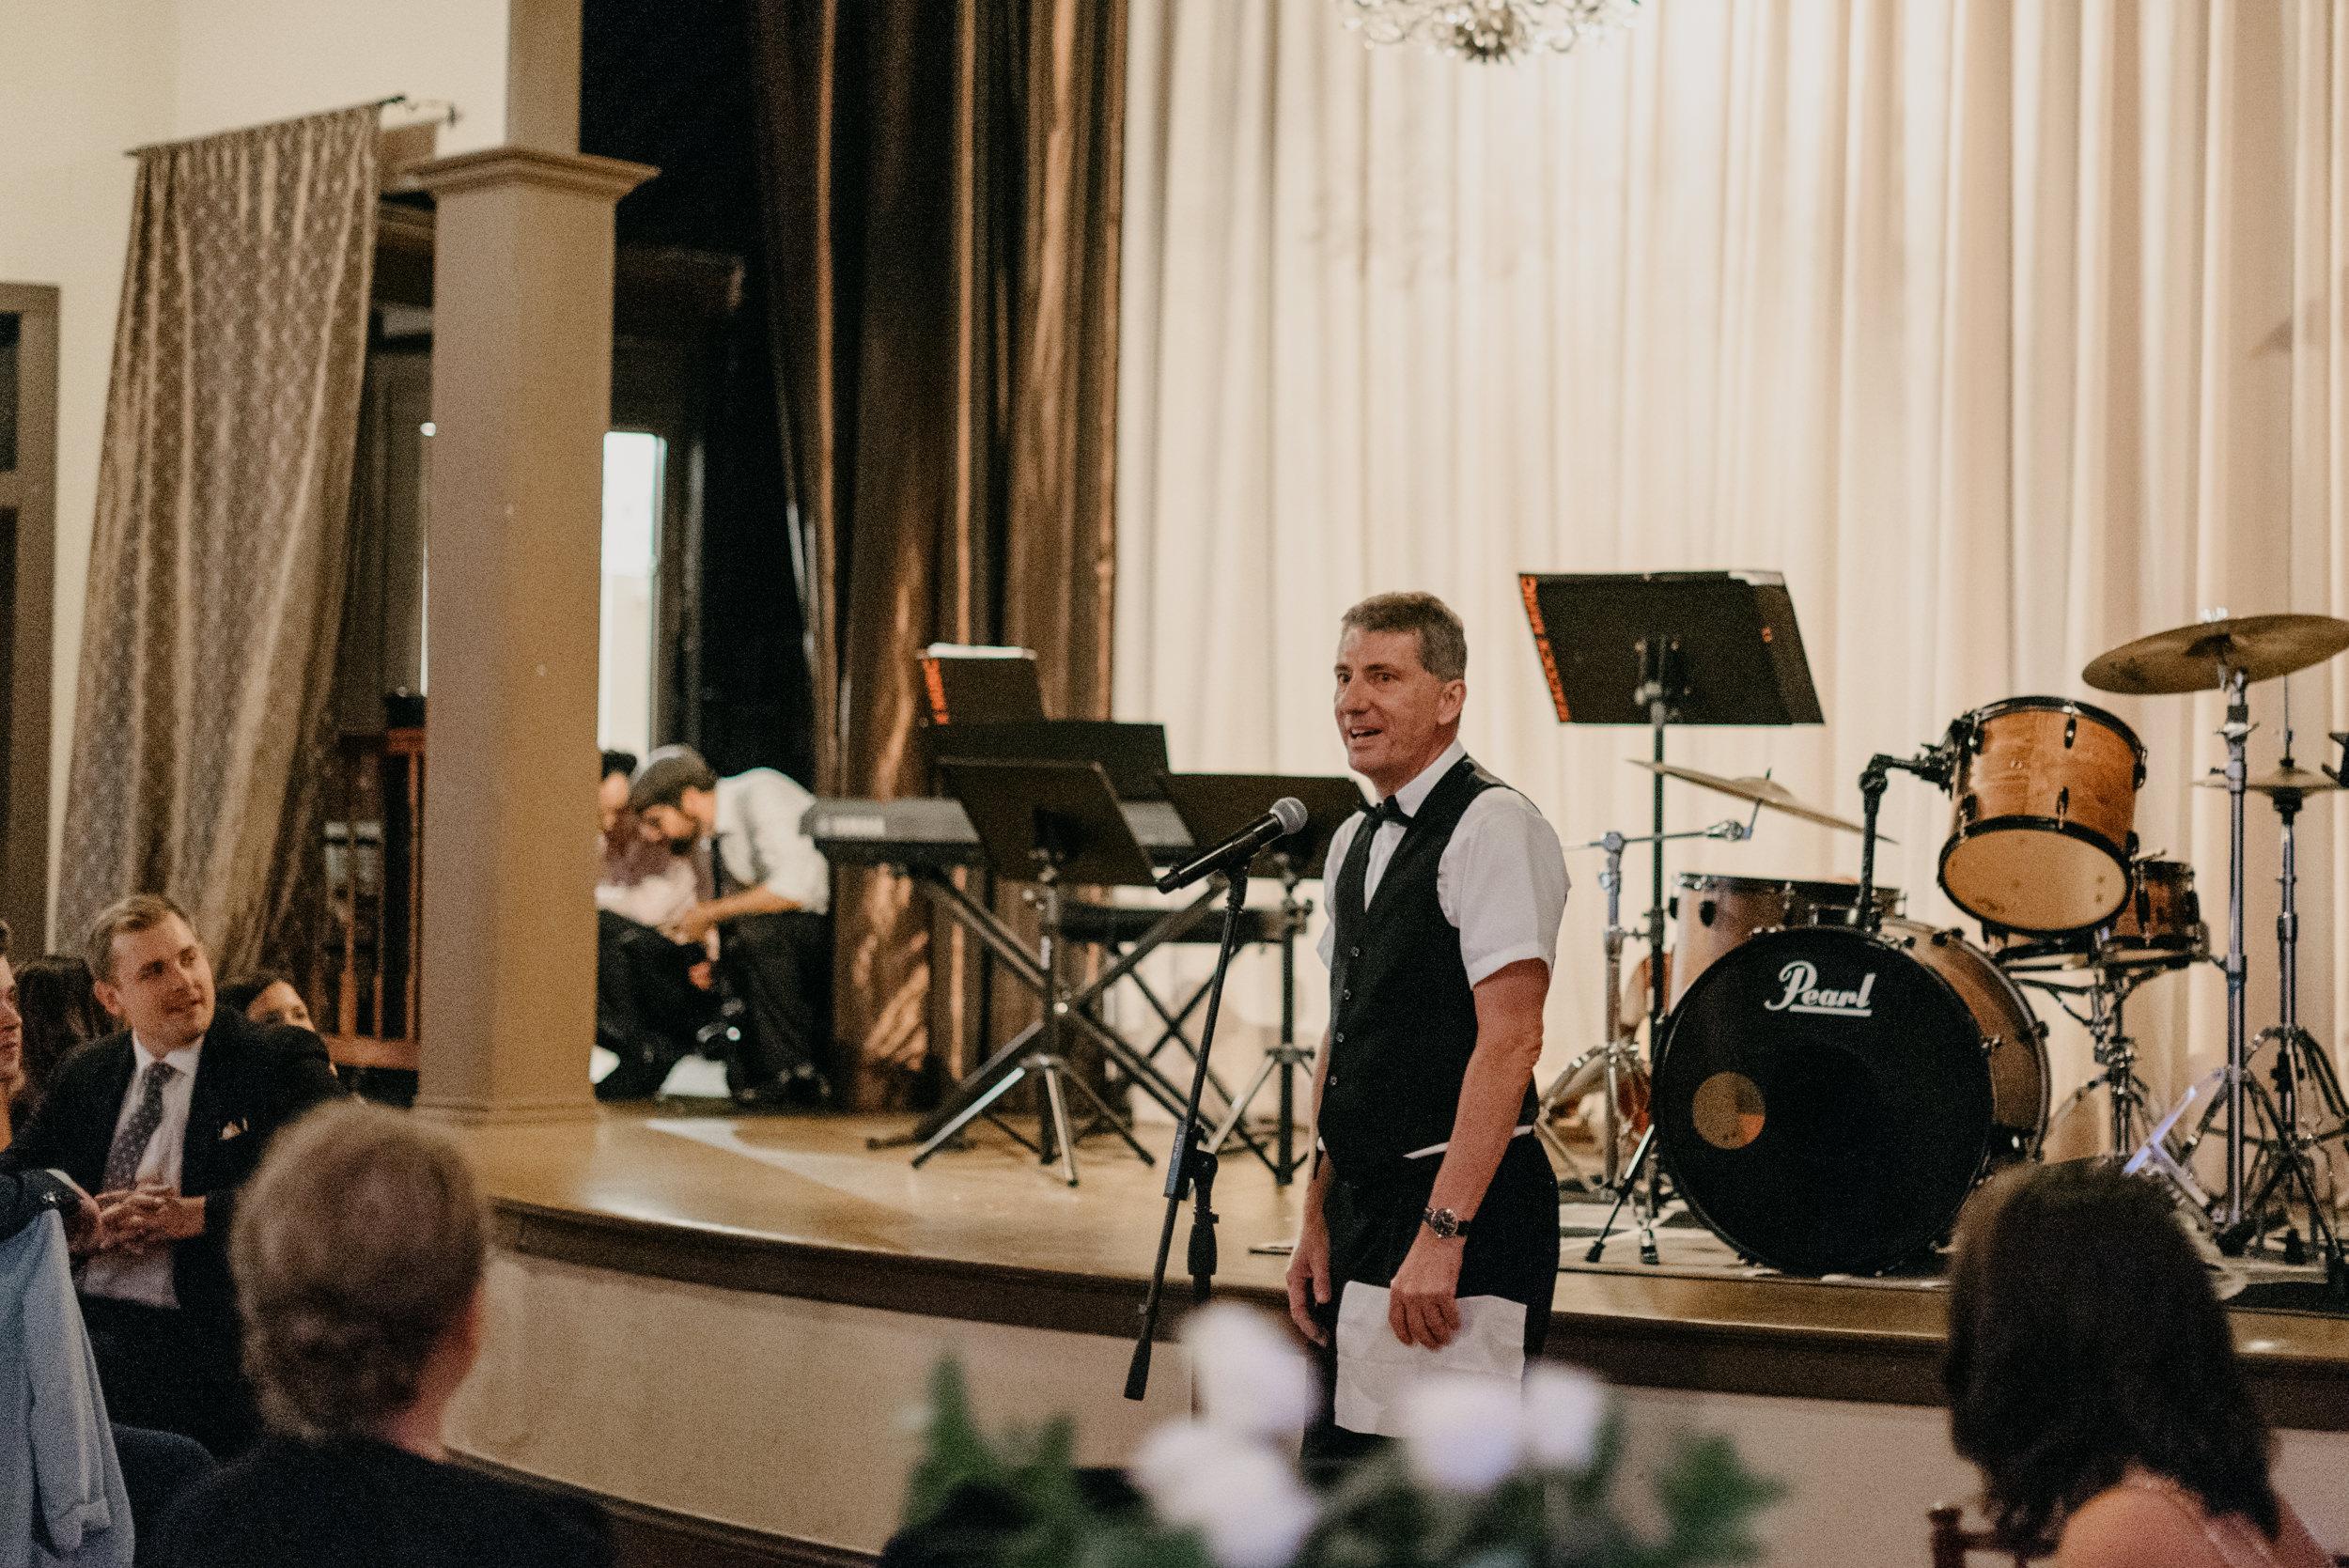 111-reception-west-end-ballroom-portland-wedding-photographer-9553.jpg